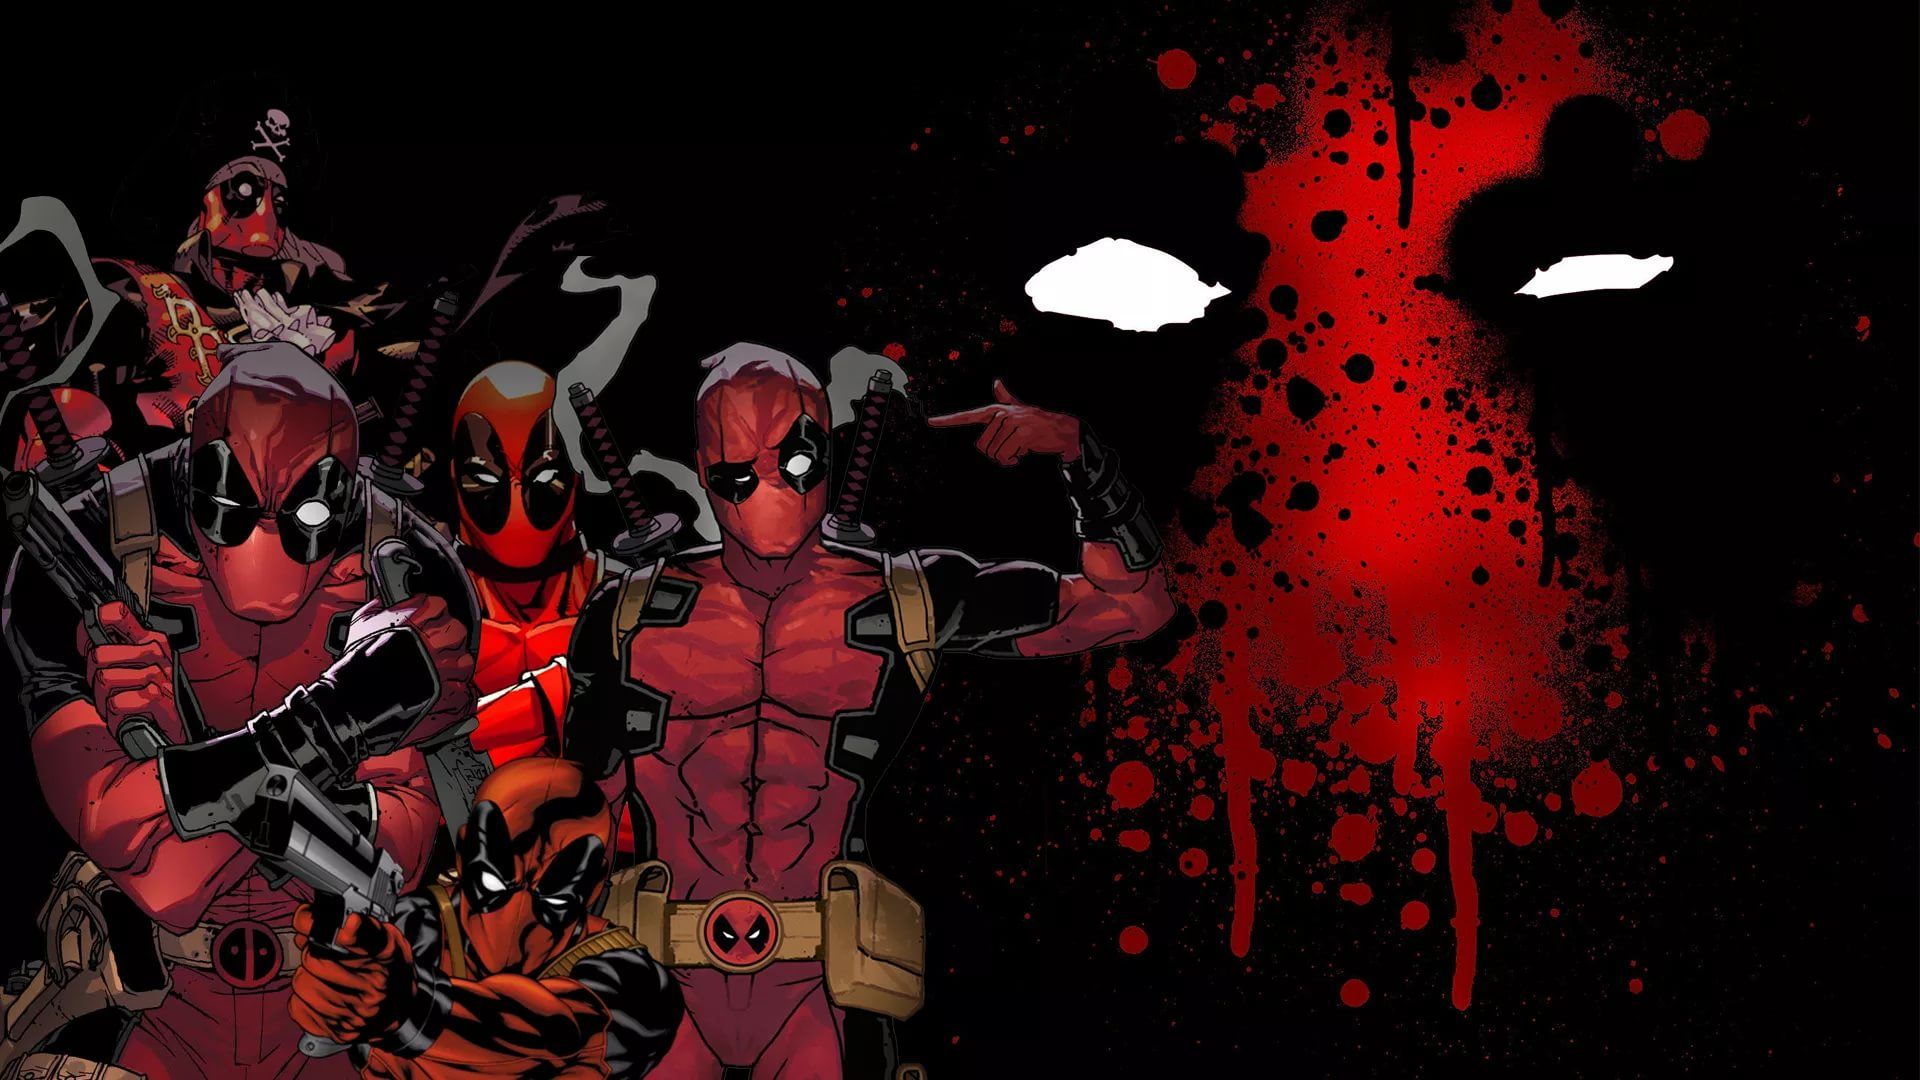 Cool Deadpool free download wallpaper